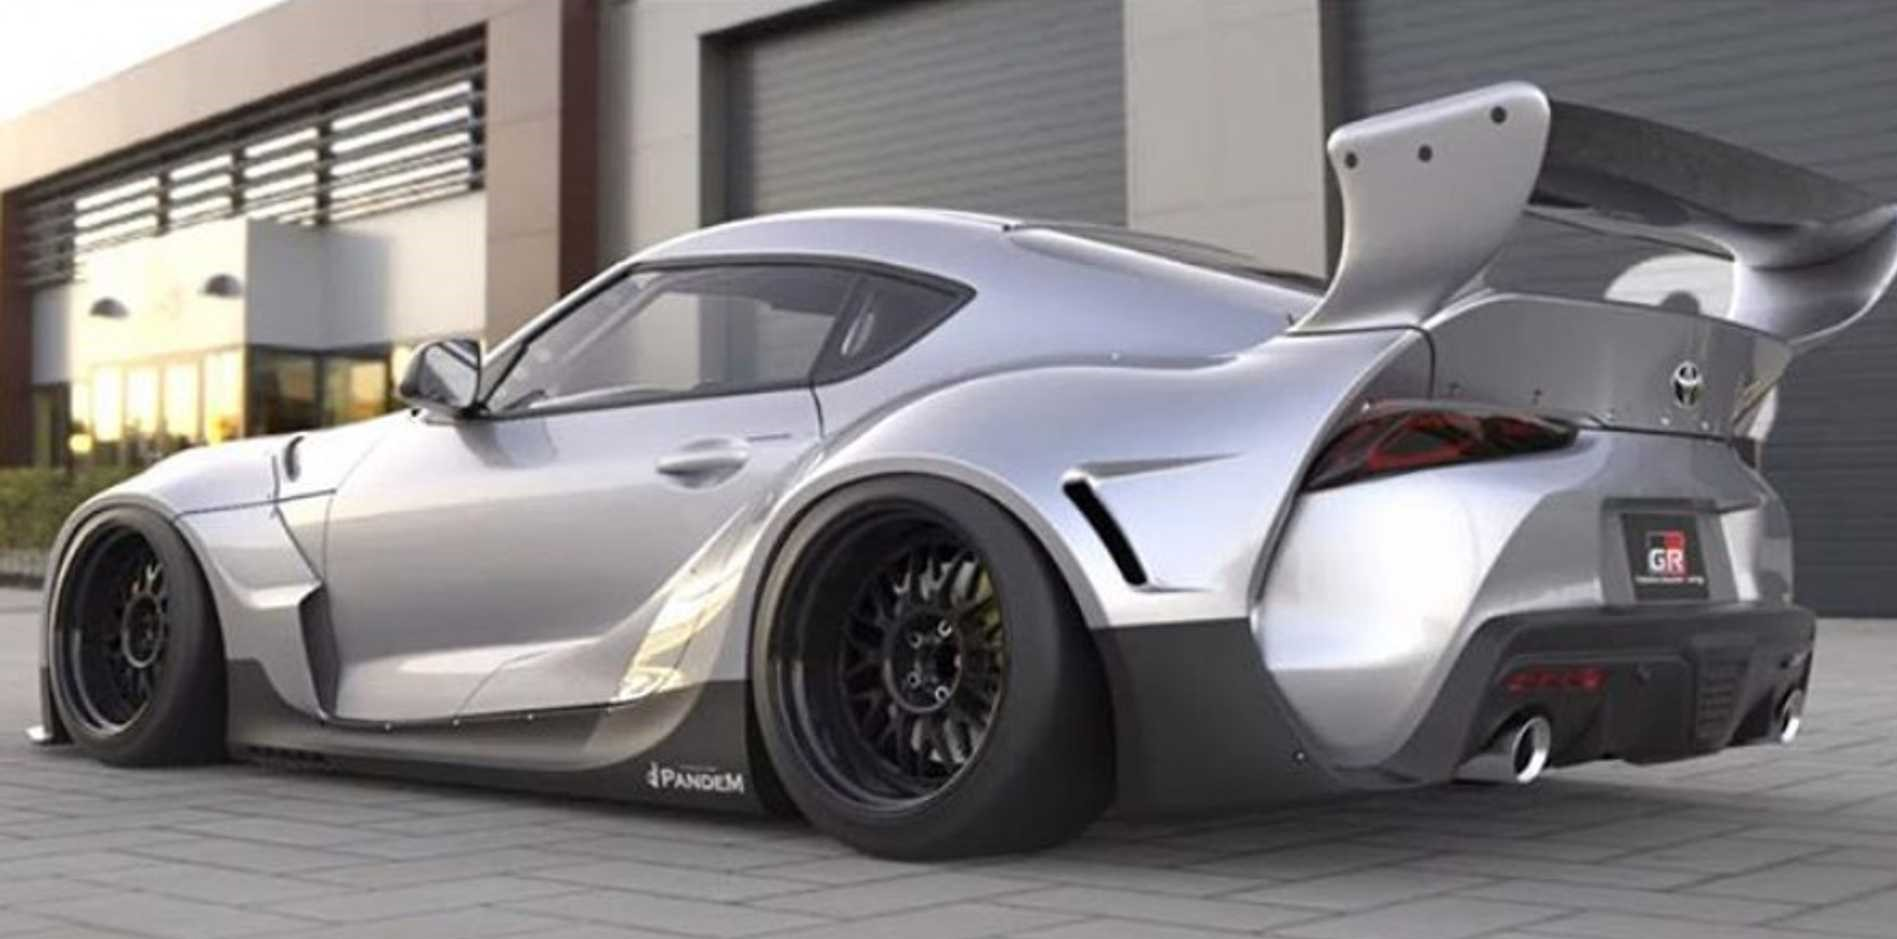 Rocket Bunny Toyota Supra wide bodykit (4)